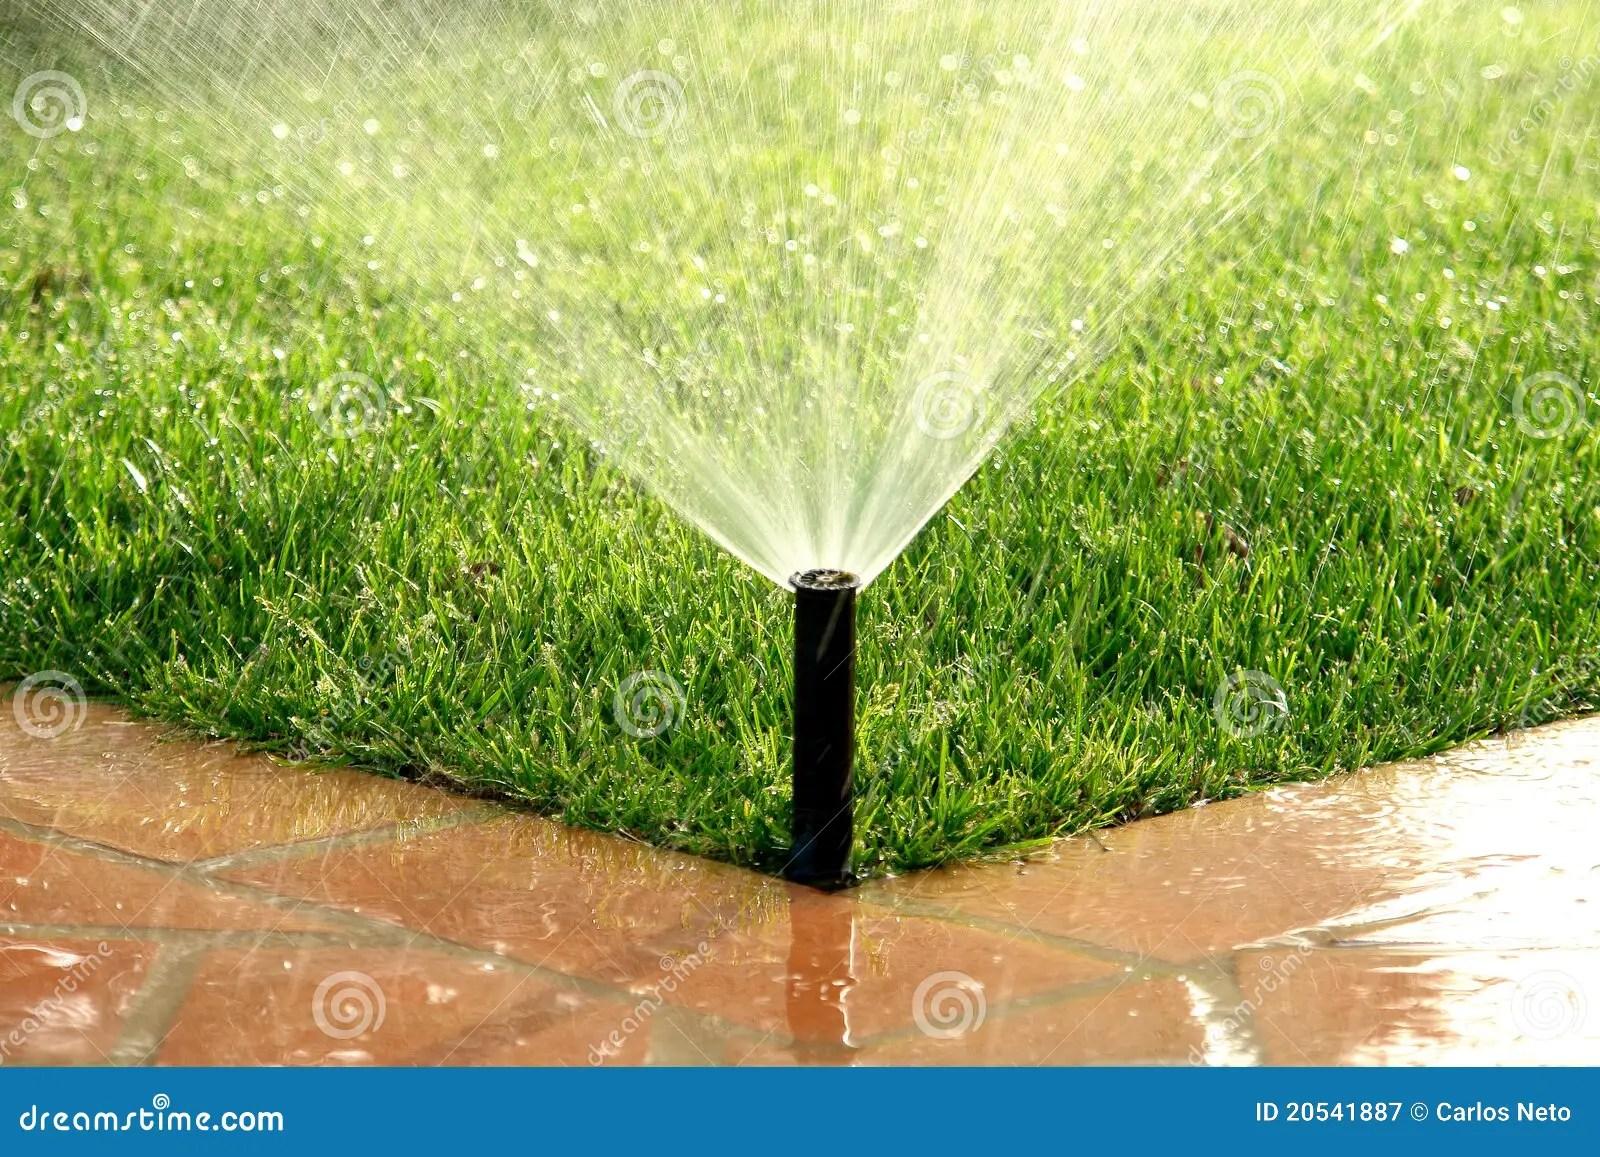 garden sprinkler system design amazing garden sprinkler system